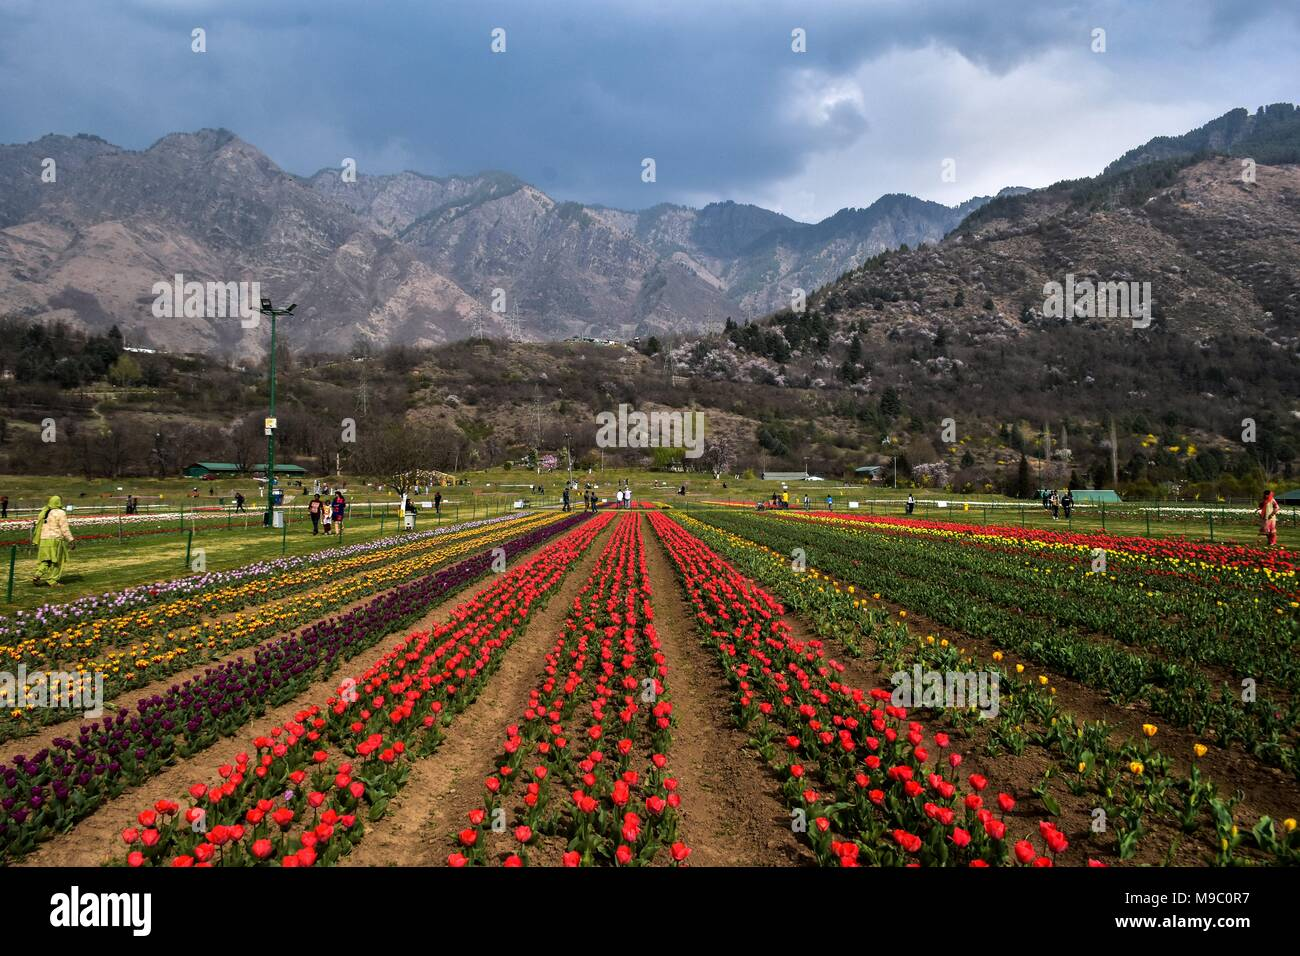 March 24, 2018 - Srinagar, J&K, Jashmir - A general view of Tulip ...